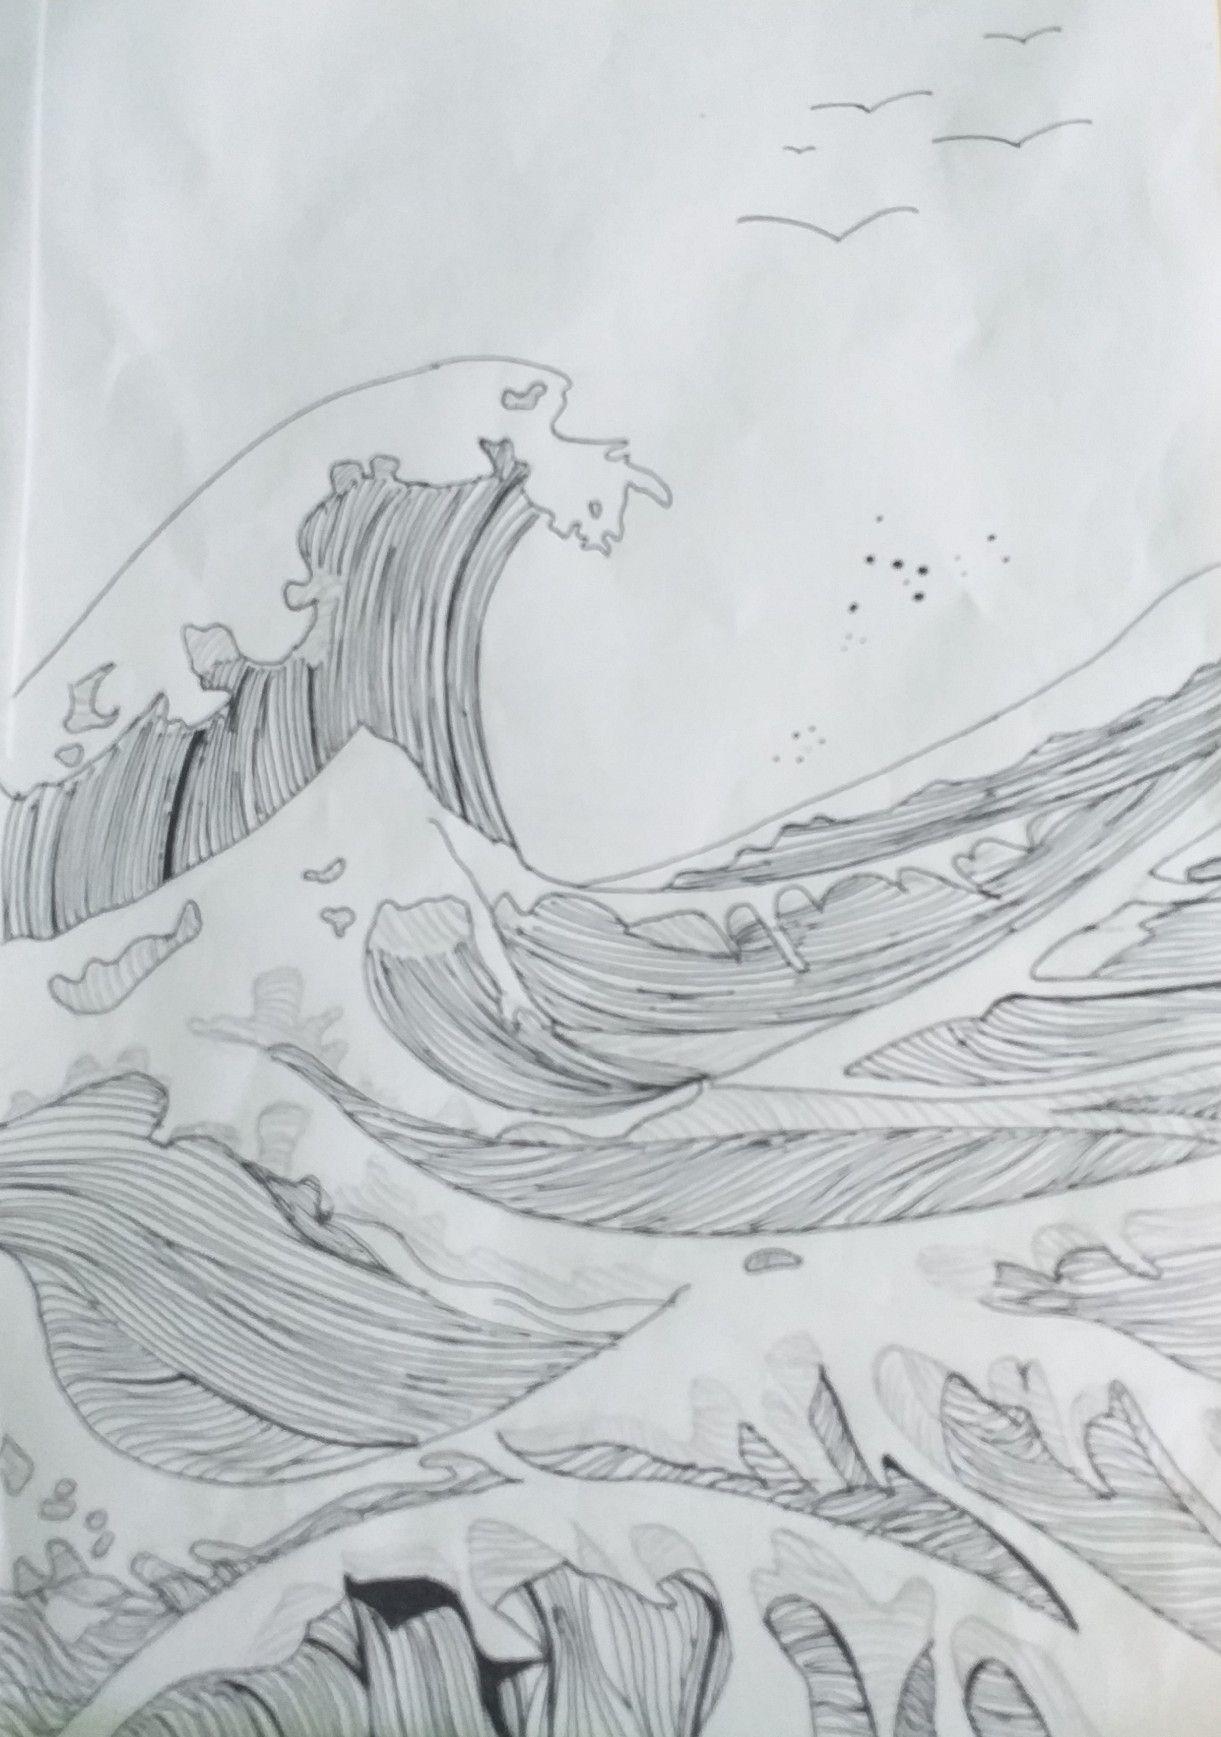 Pin De Carolina Alvaro En Marina Playa Dibujo Dibujo Del Mar Paisaje A Lapiz